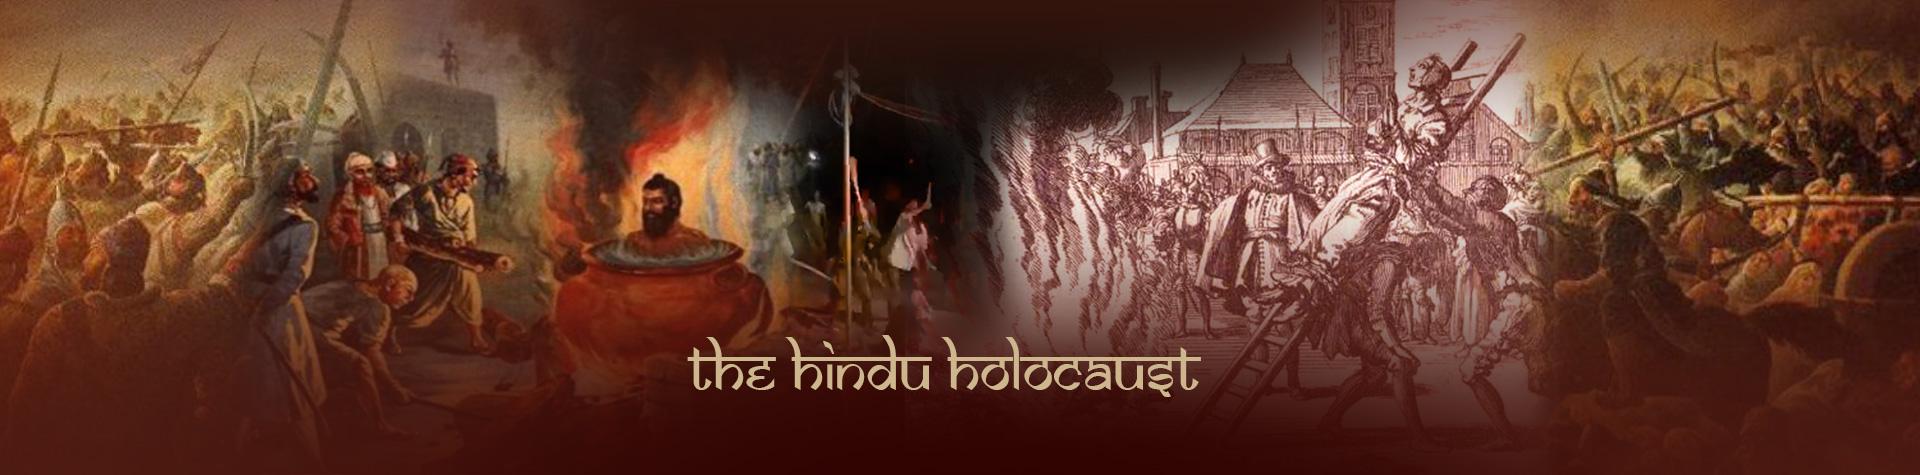 the Hindu Holocaust